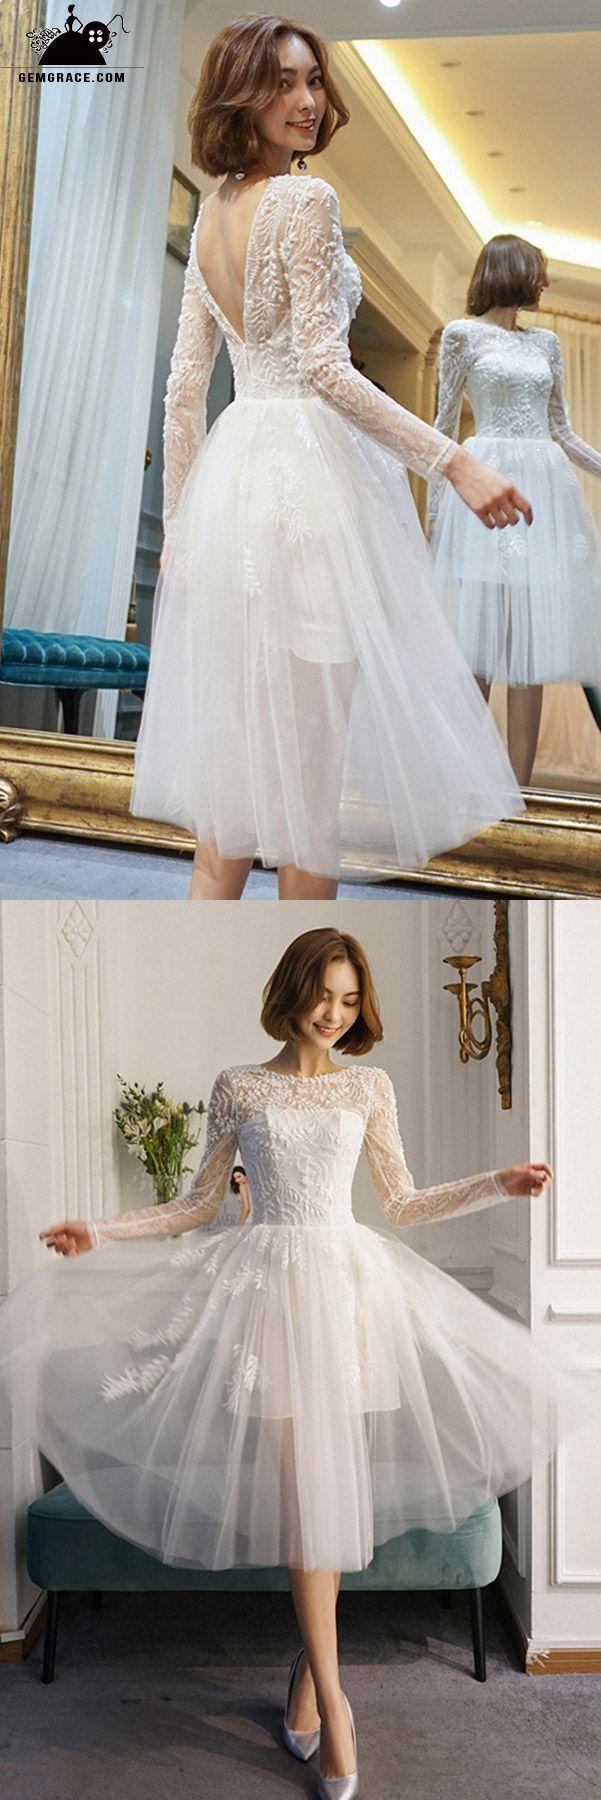 Chic short seethrough tulle vback short wedding dress with beading